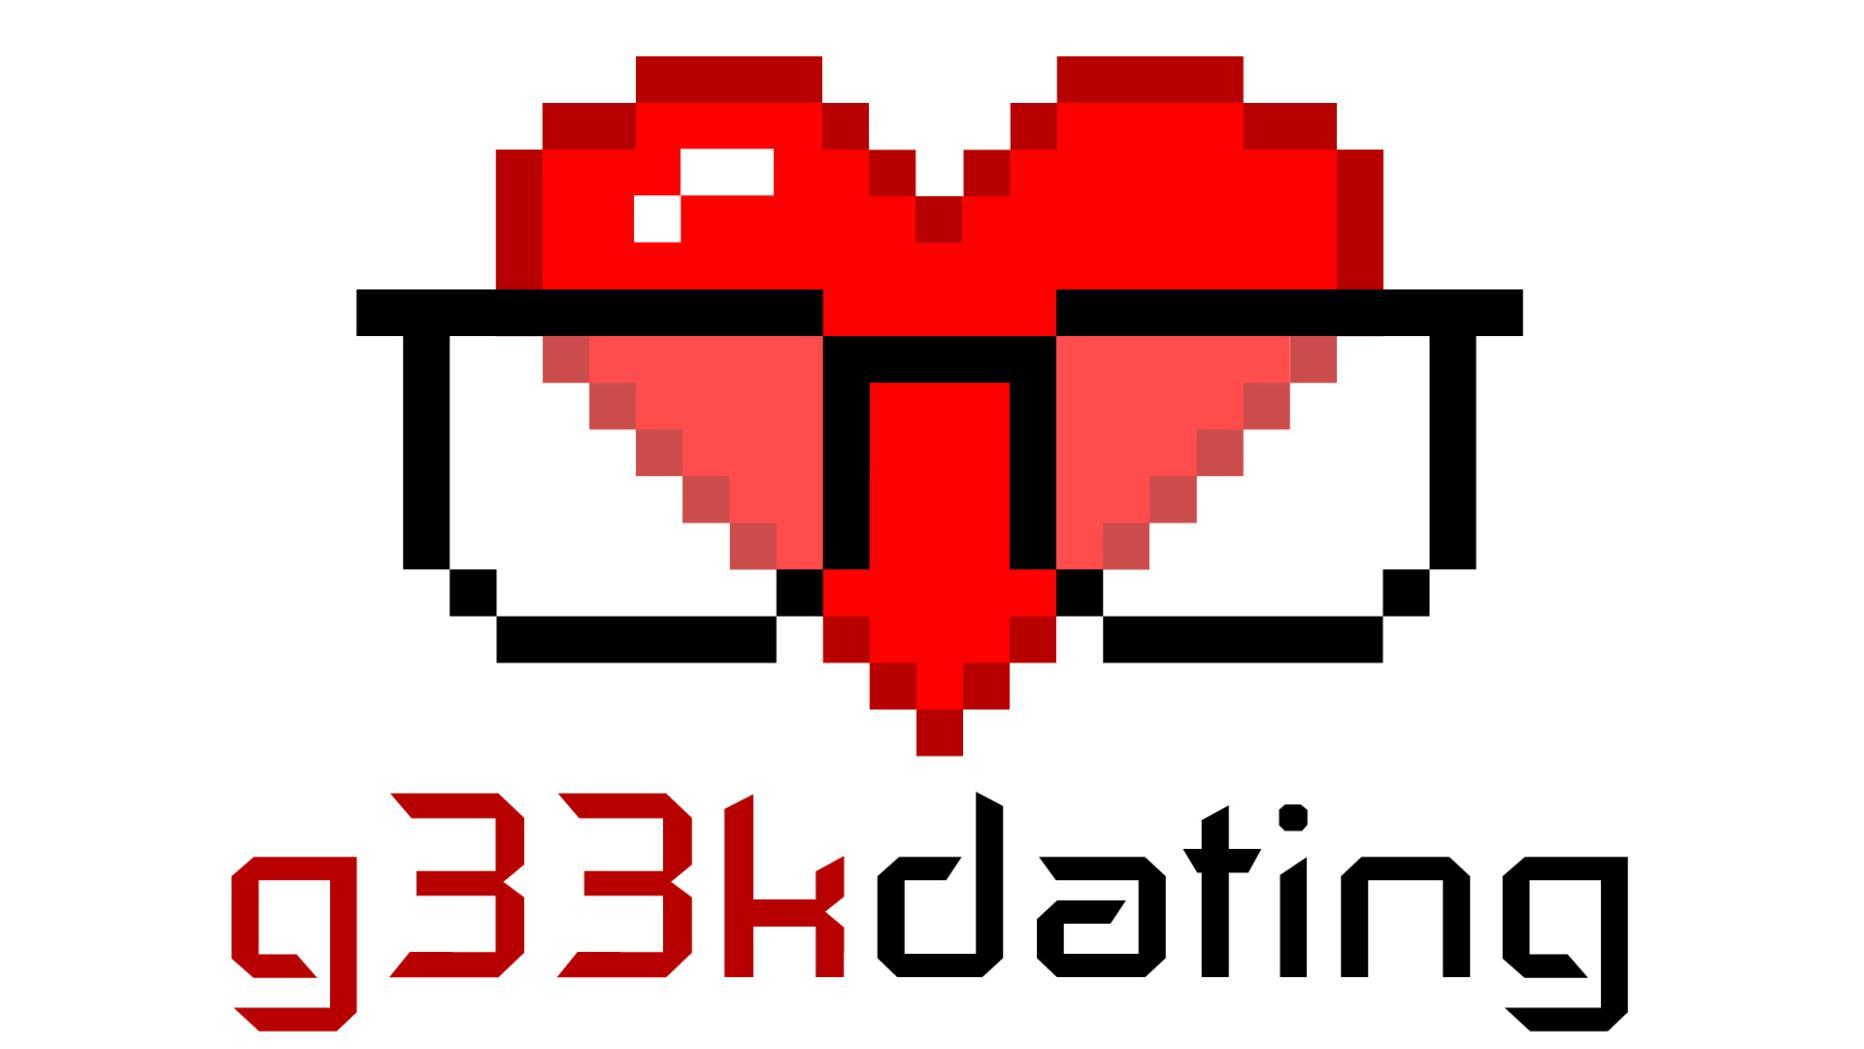 Partnerbrse fr Gamer - Deutsches Portal g33kdating gestartet